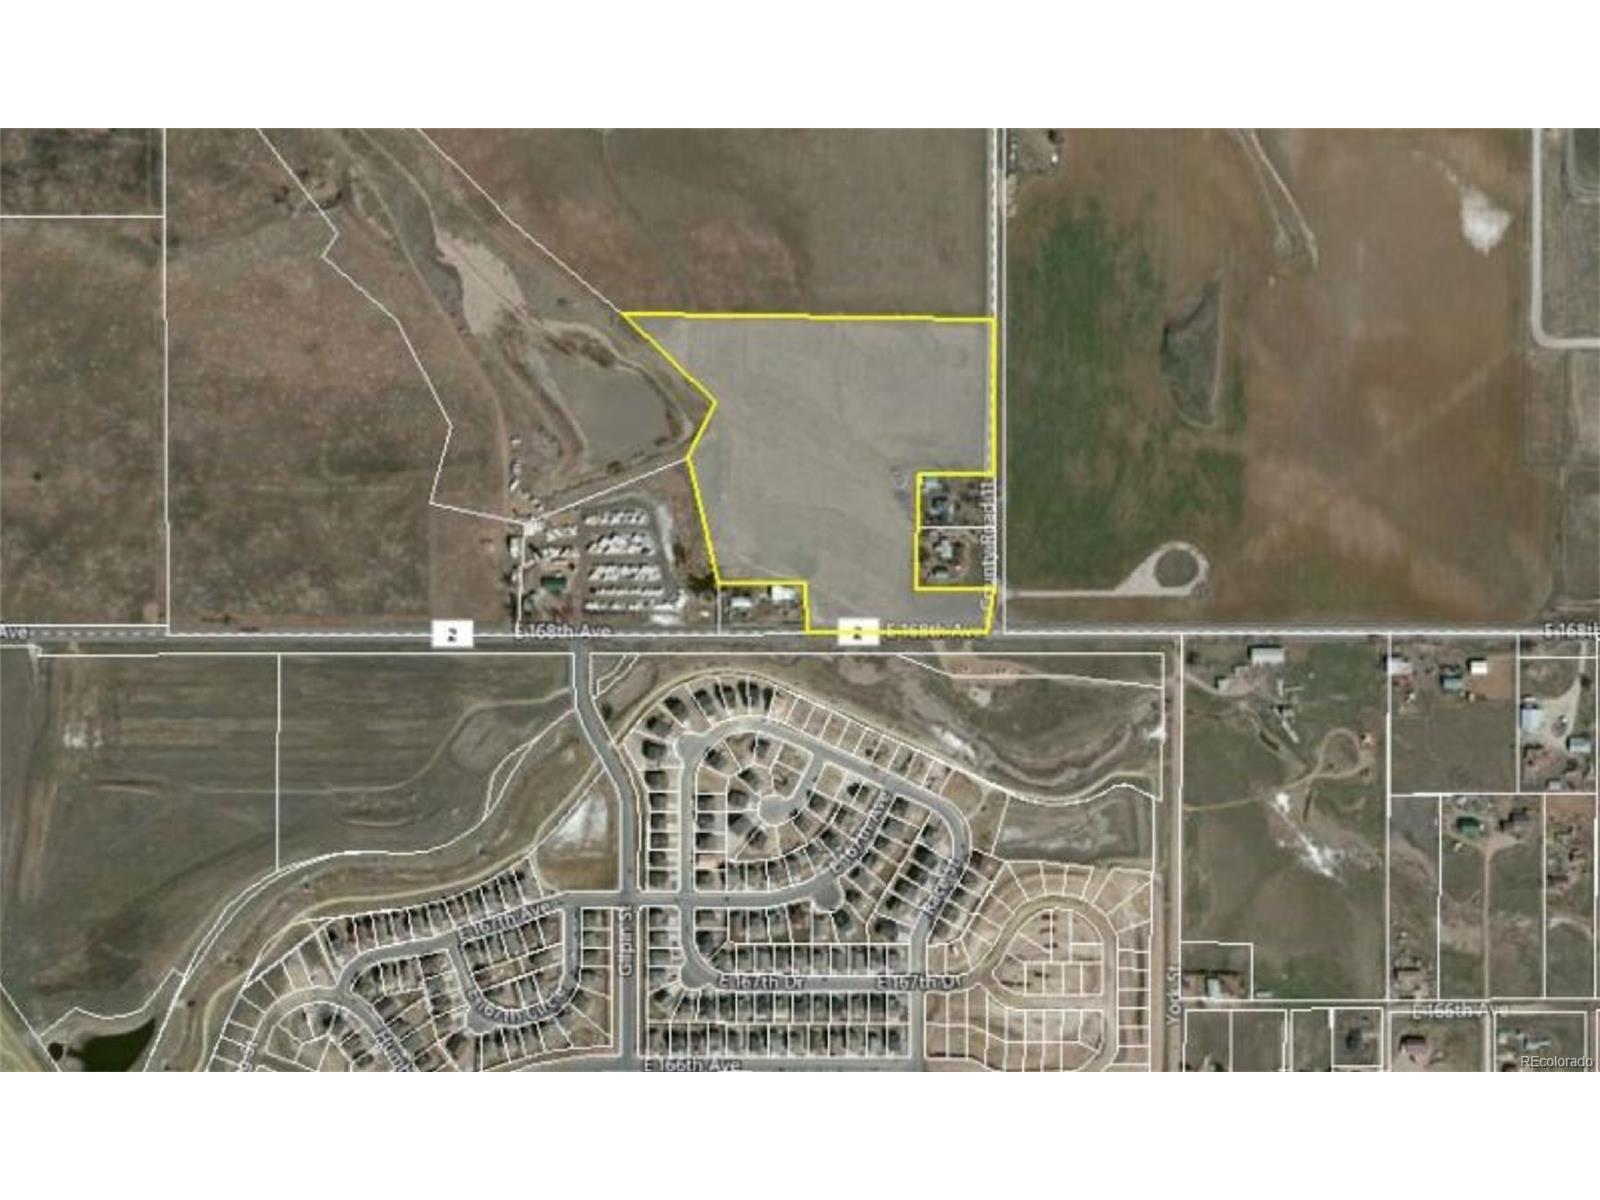 WCR 11 E. 168th Avenue, Broomfield, CO 80516 - Broomfield, CO real estate listing